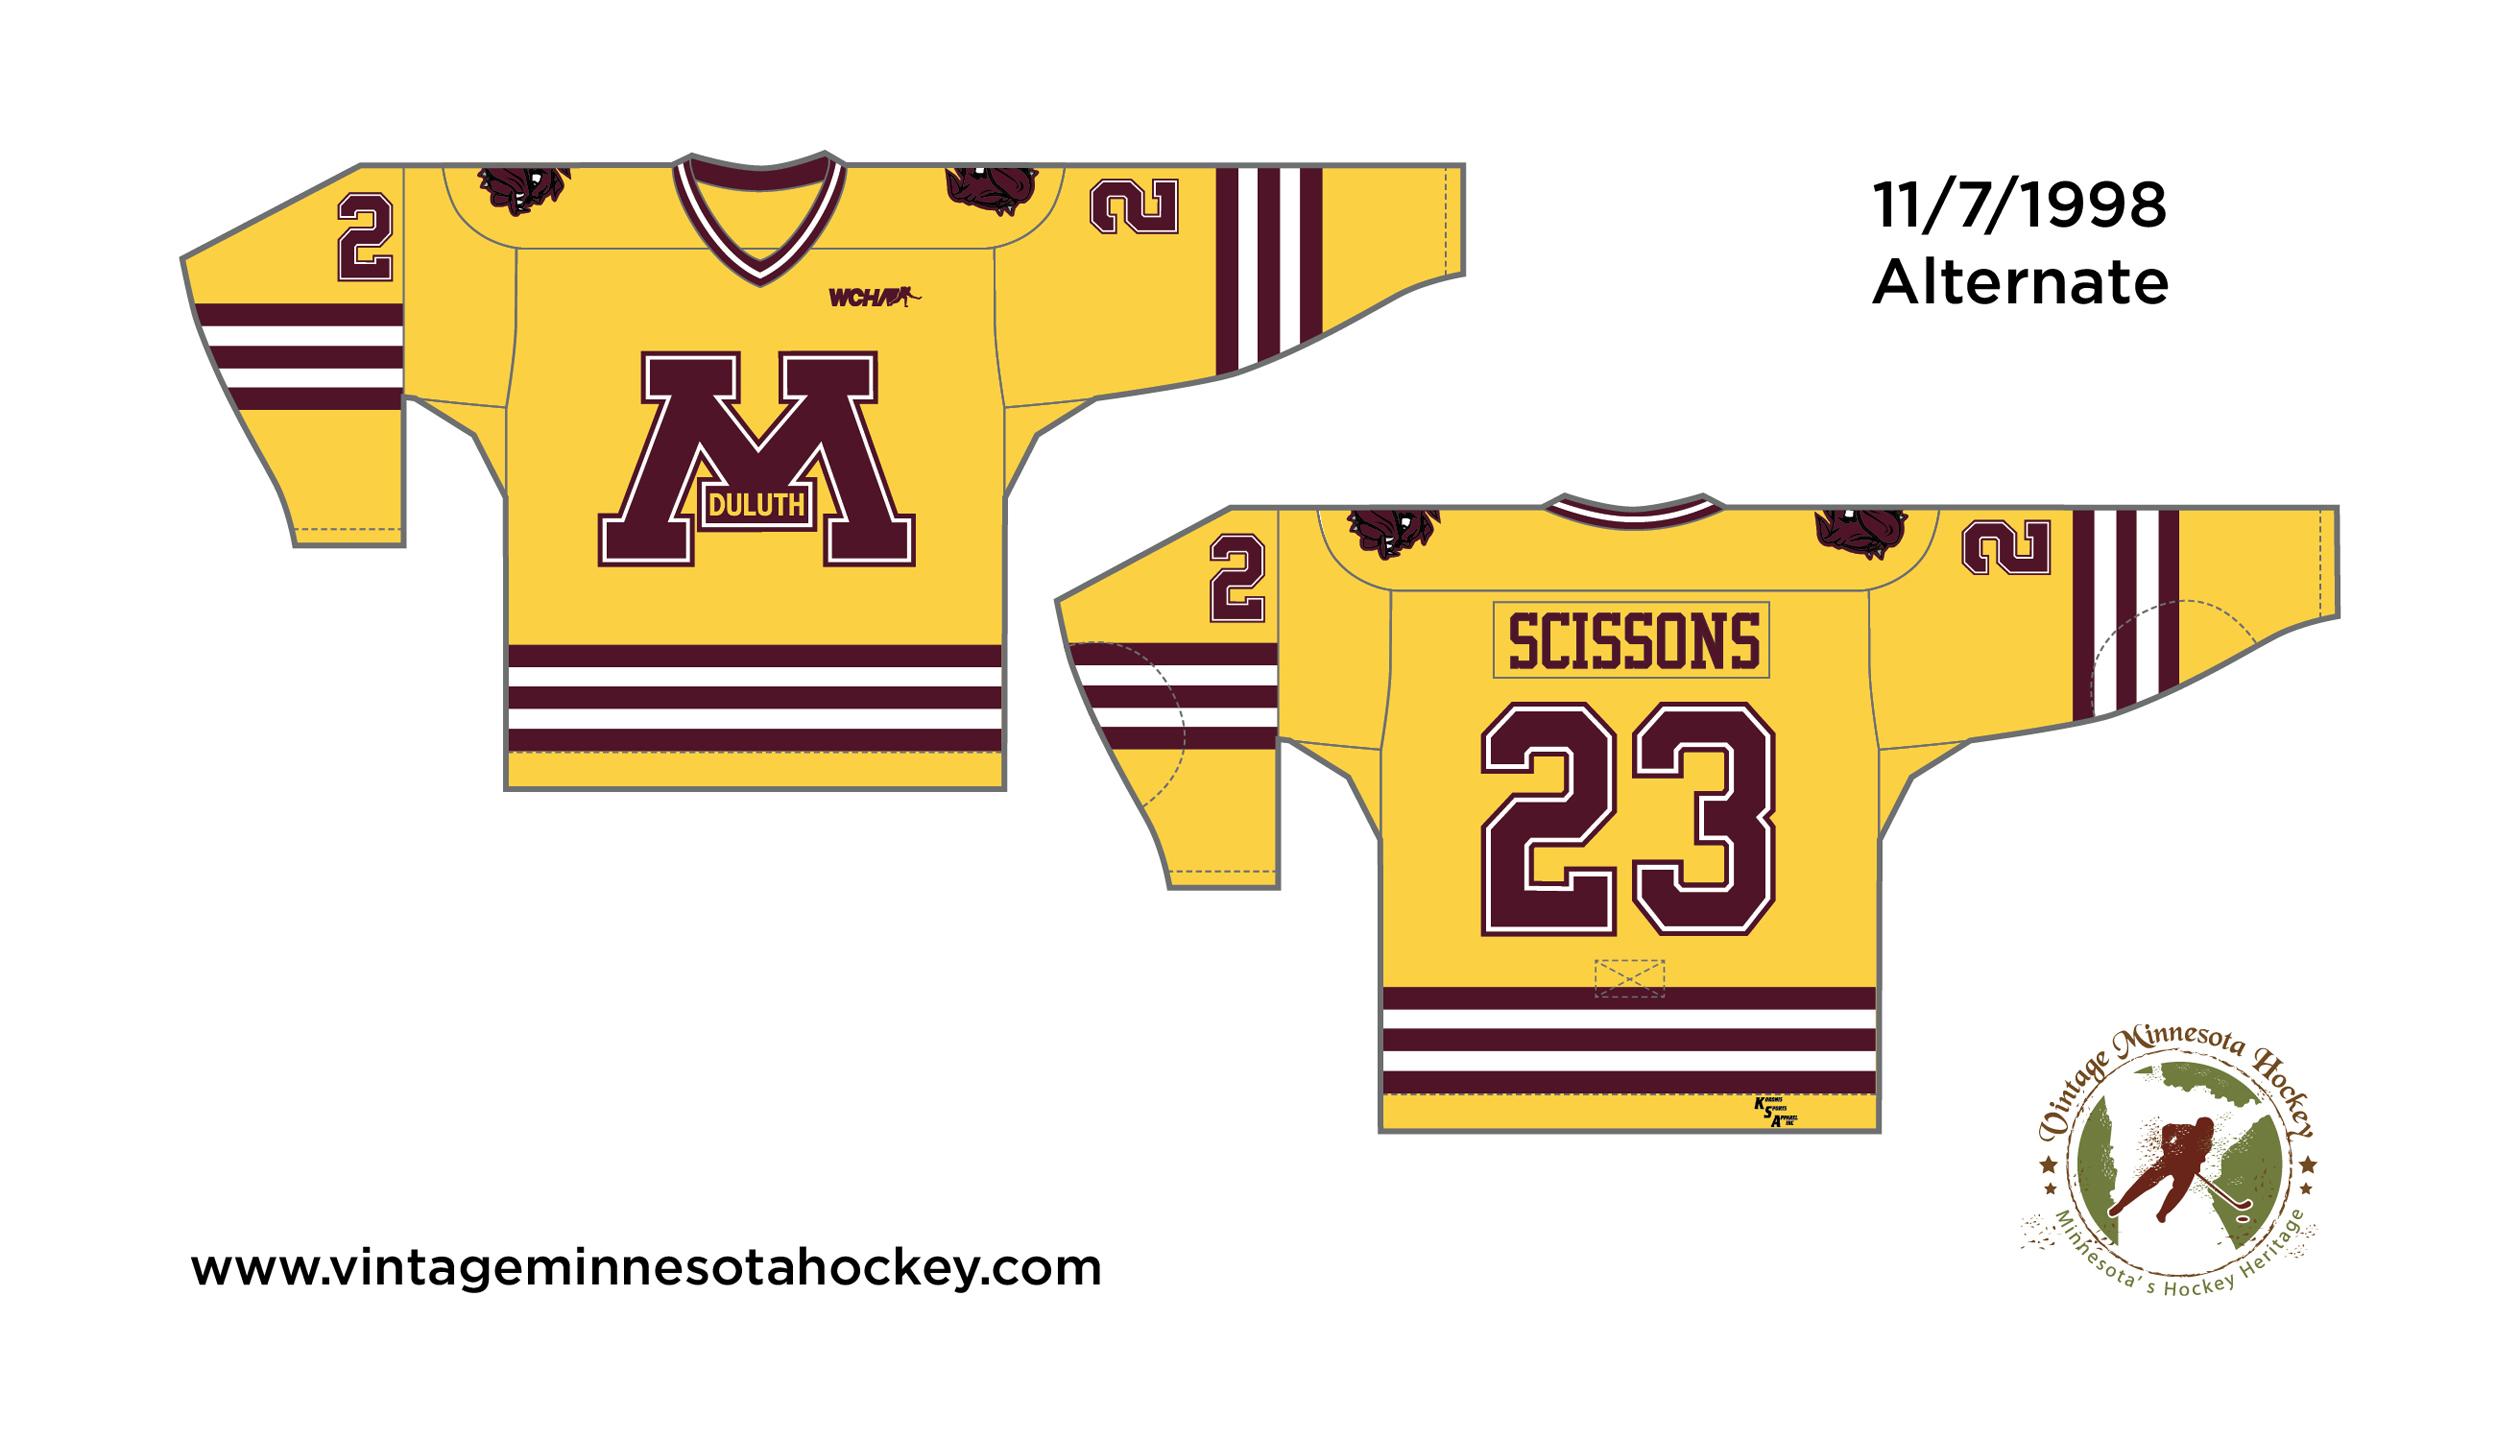 Column  A call for alternate jerseys for men s hockey — The Statesman 059f3296de6